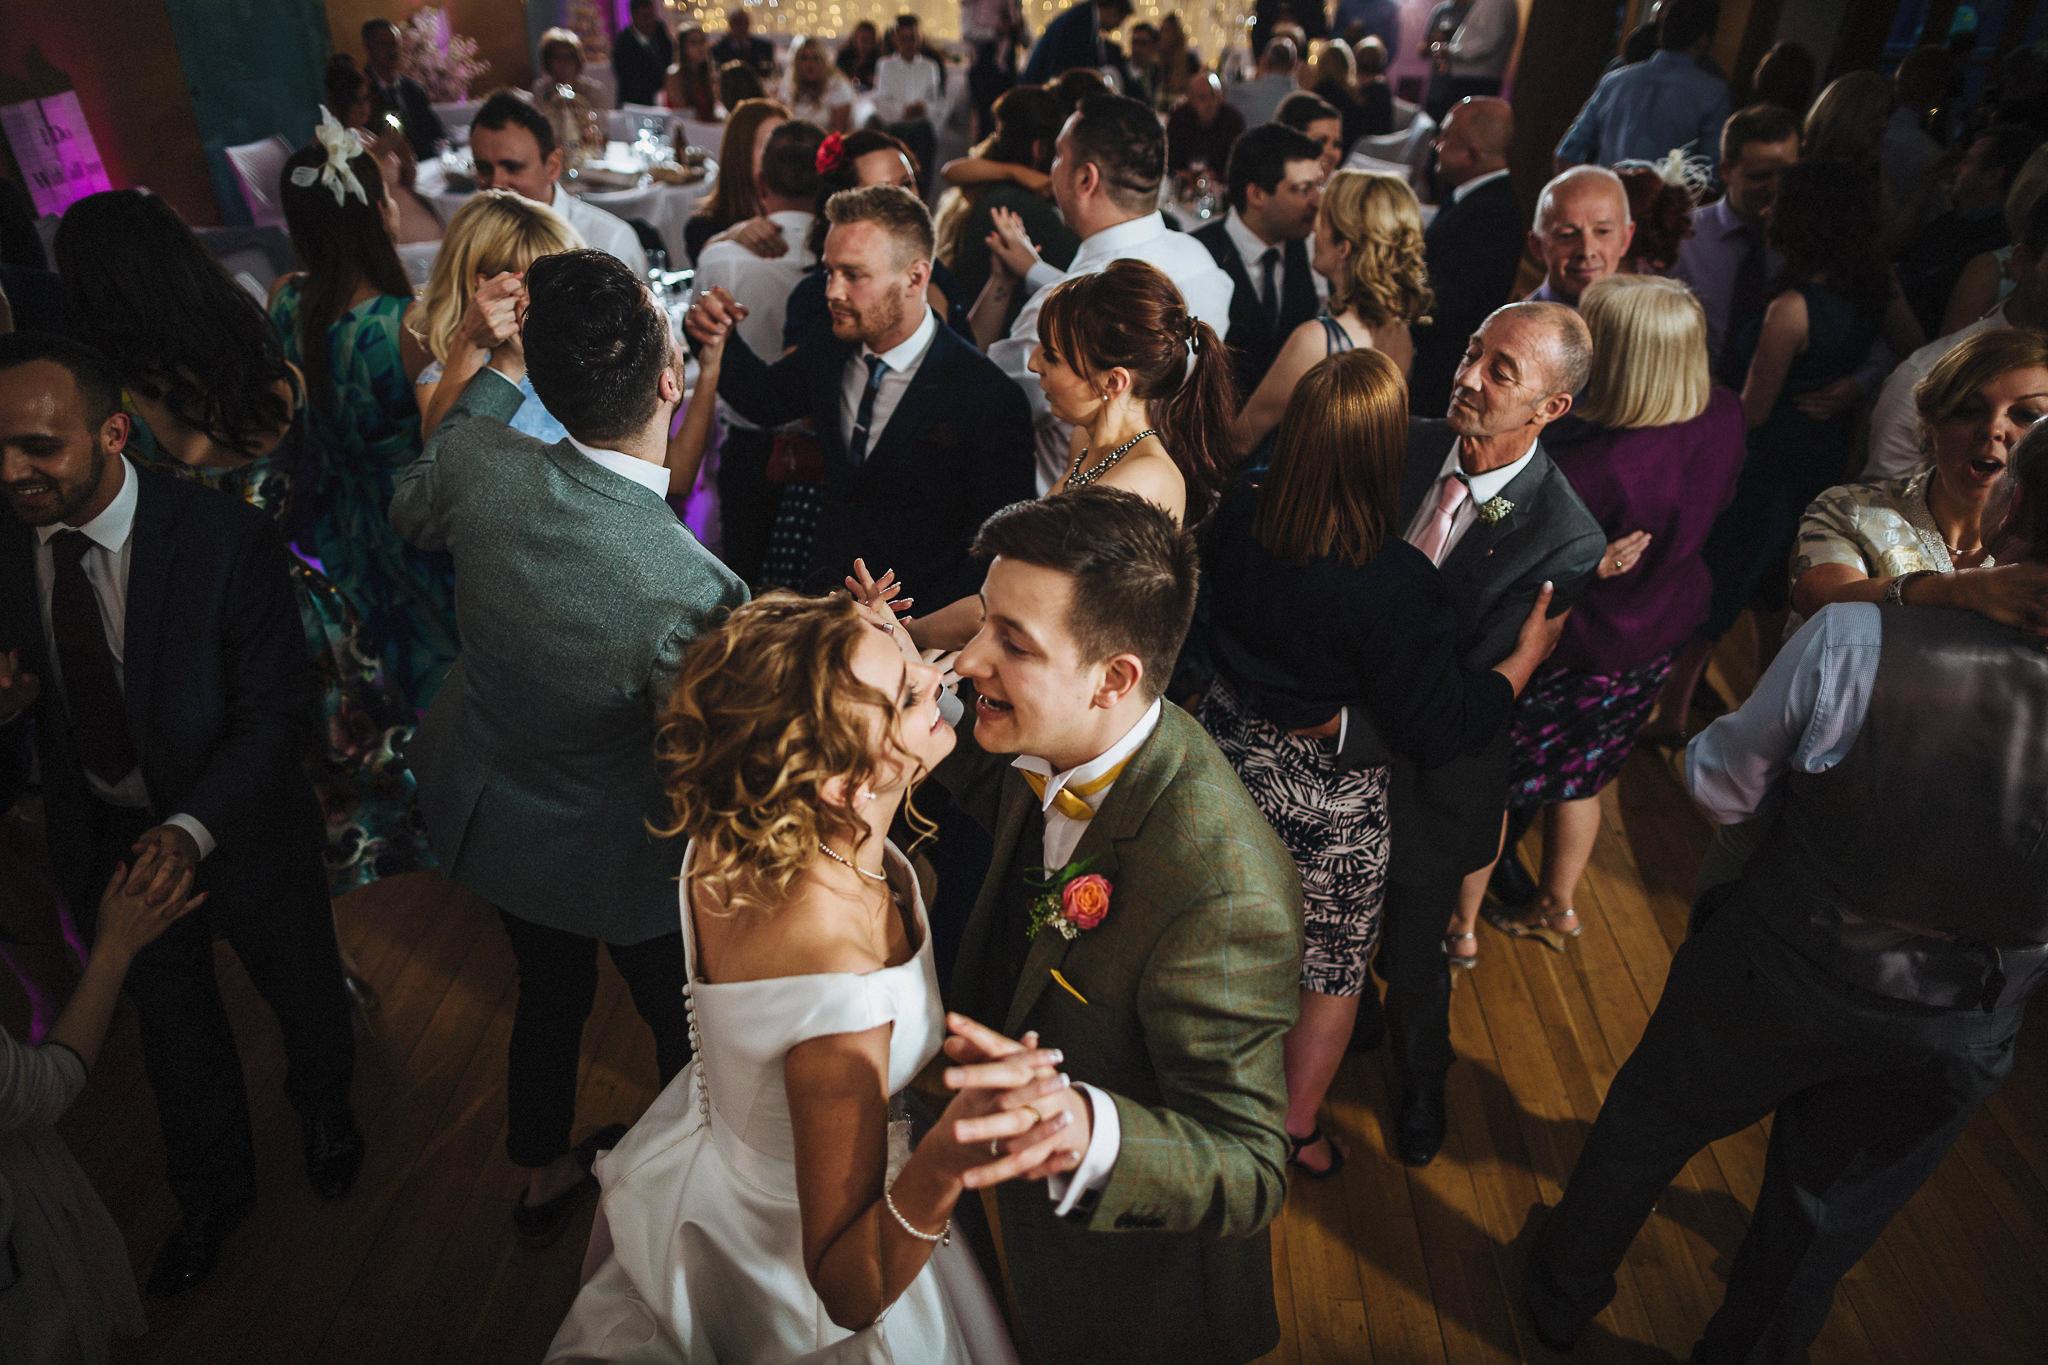 Lancashire-Creative-natural-documentary-wedding-photography-90086